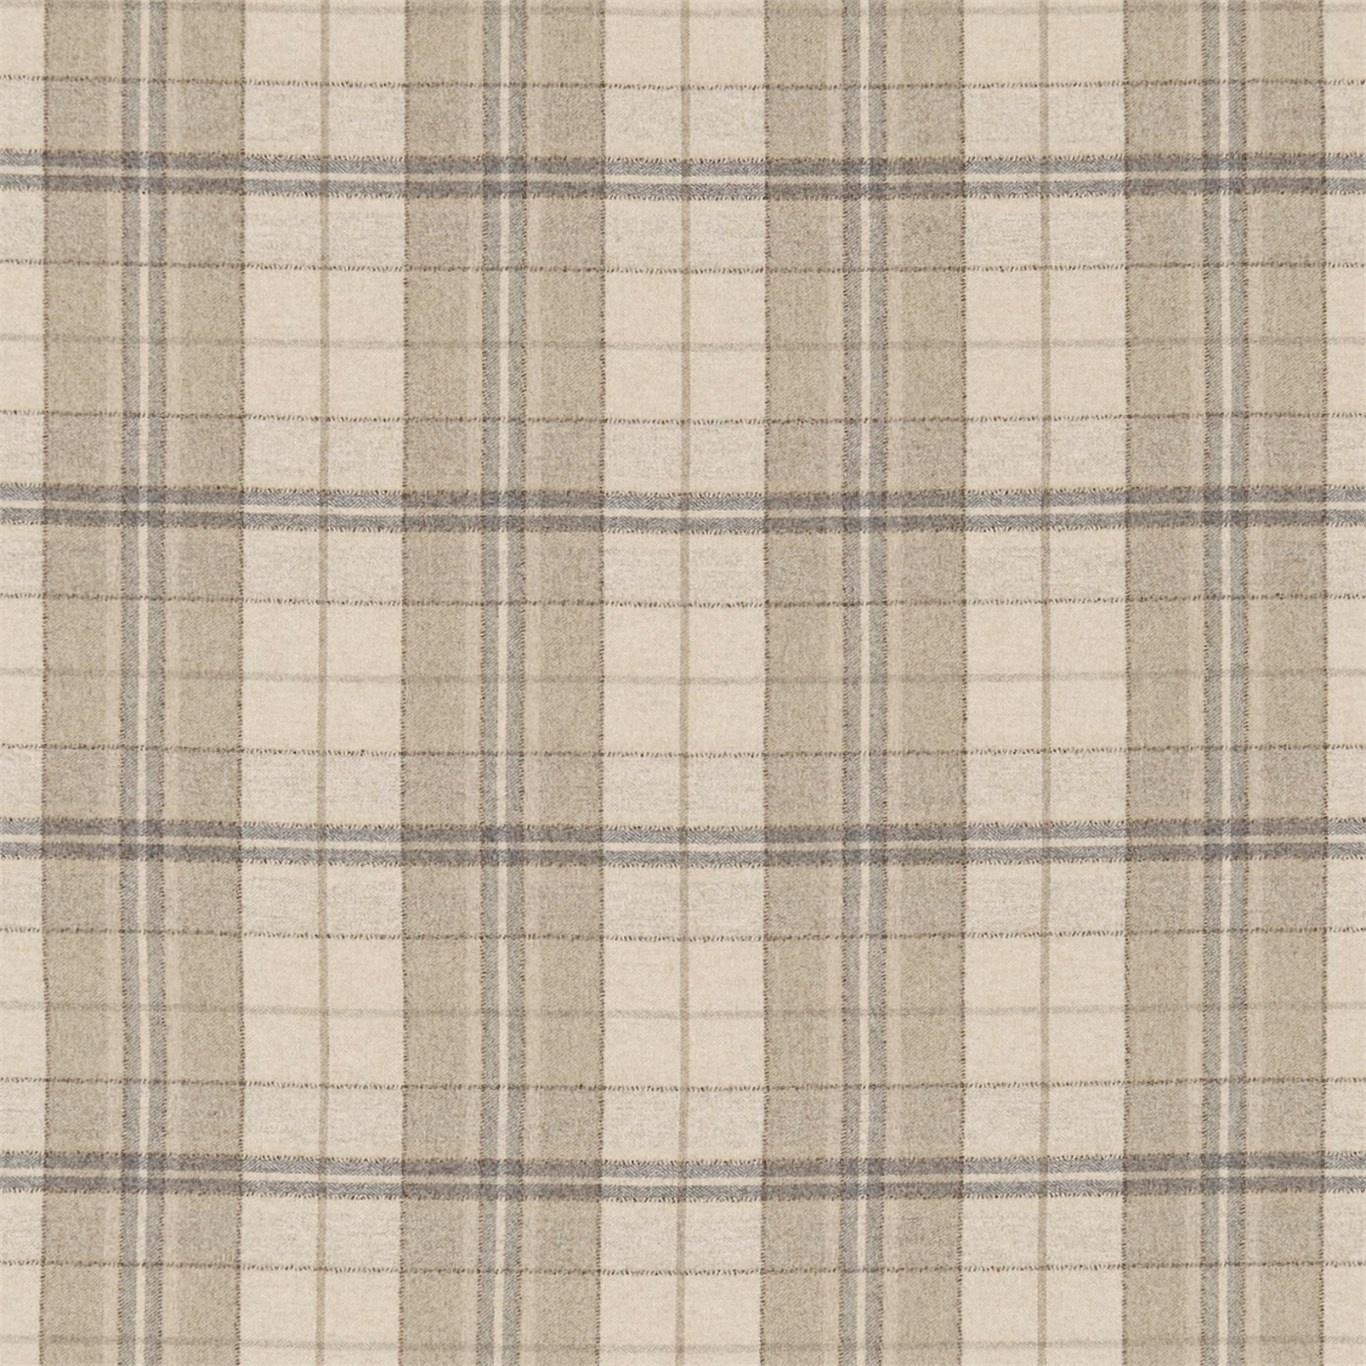 Image of Sanderson Milton Linen/Pebble Fabric 233247